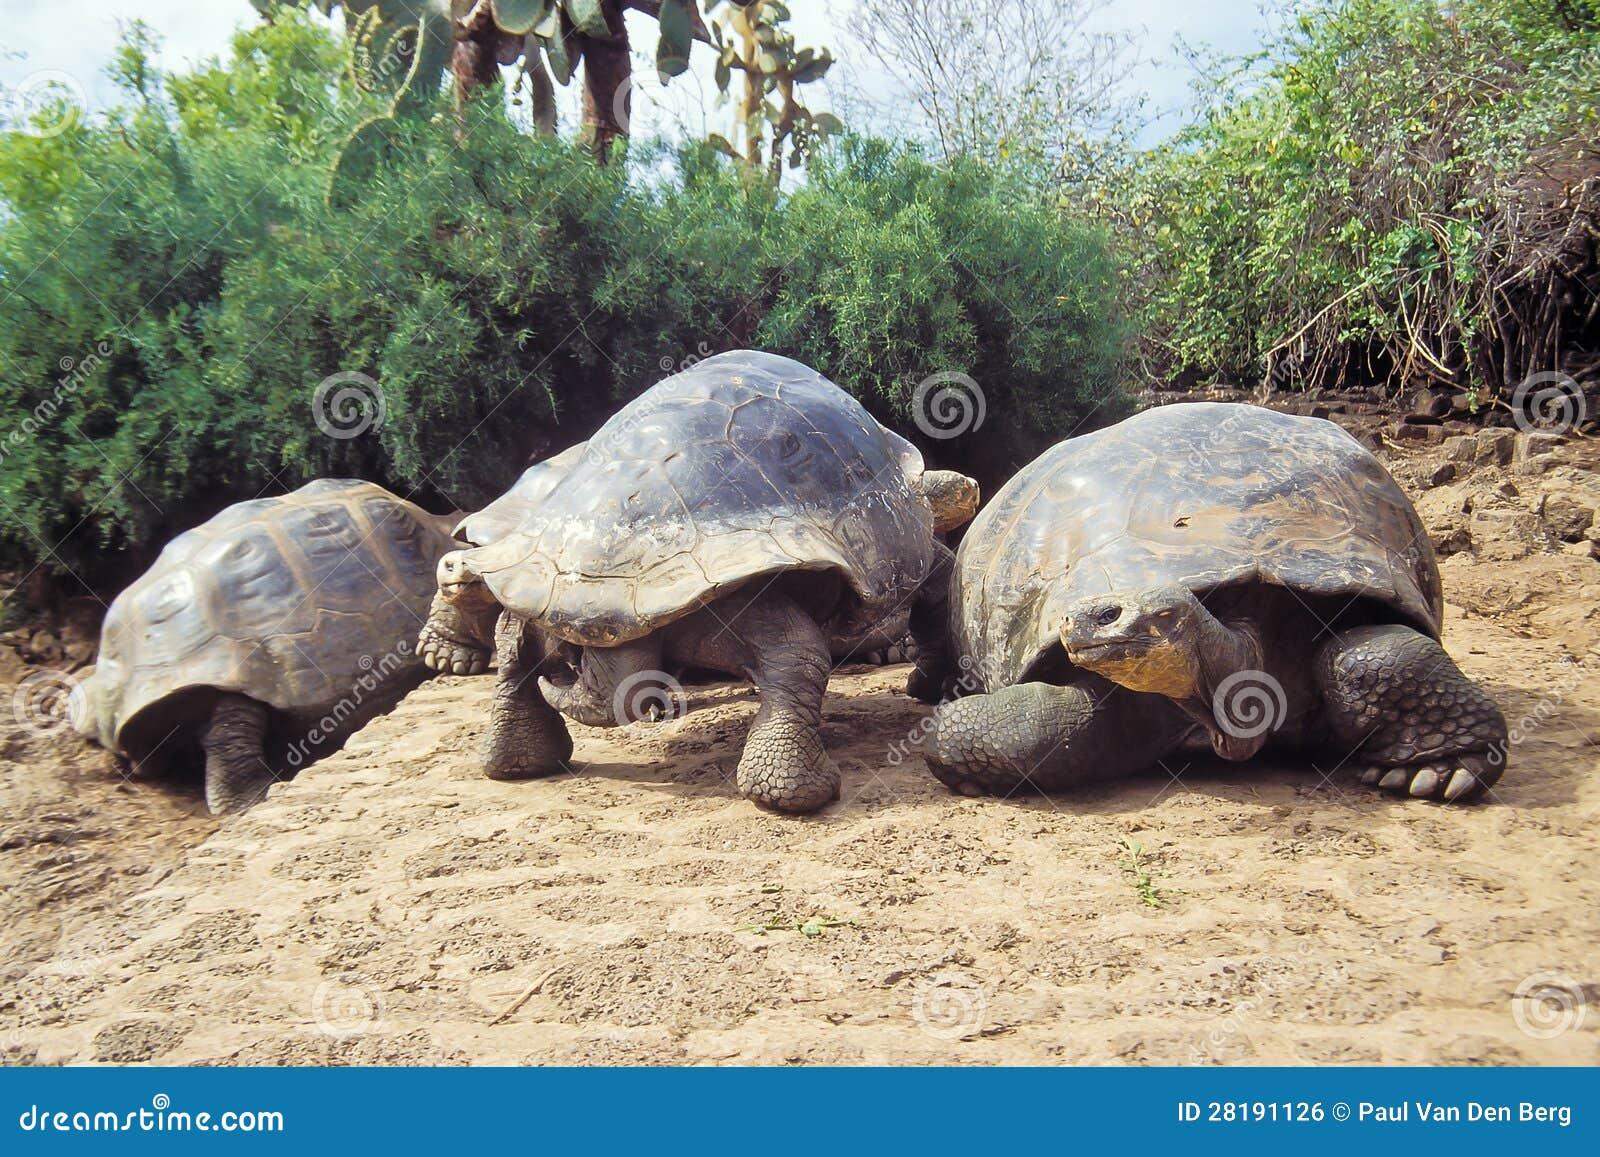 Riesige Schildkröte, Galapagos-Inseln, Ecuador